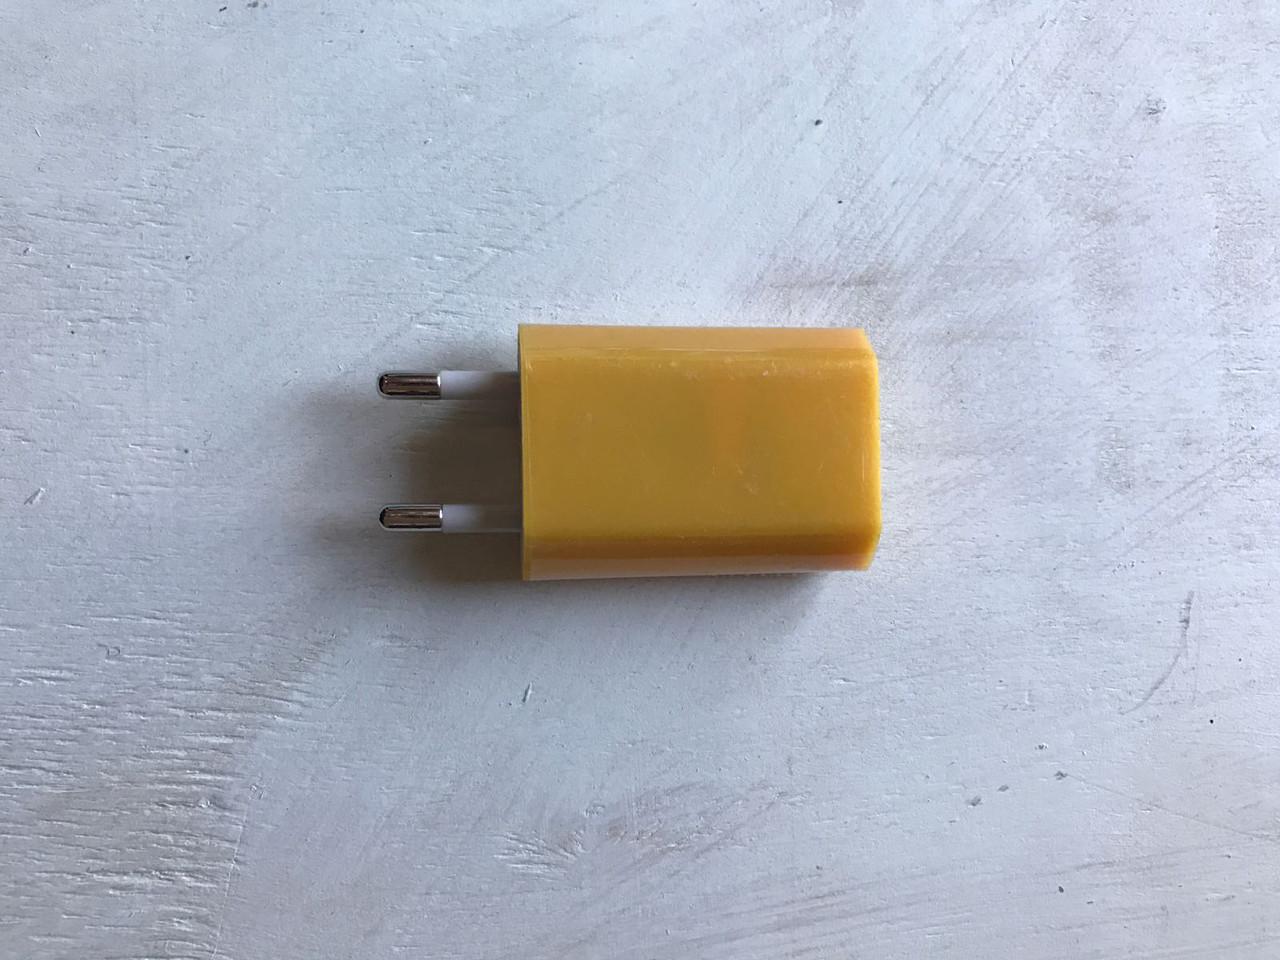 USB адаптер (переходник) для розетки 5V/1.5A жёлтого цвета